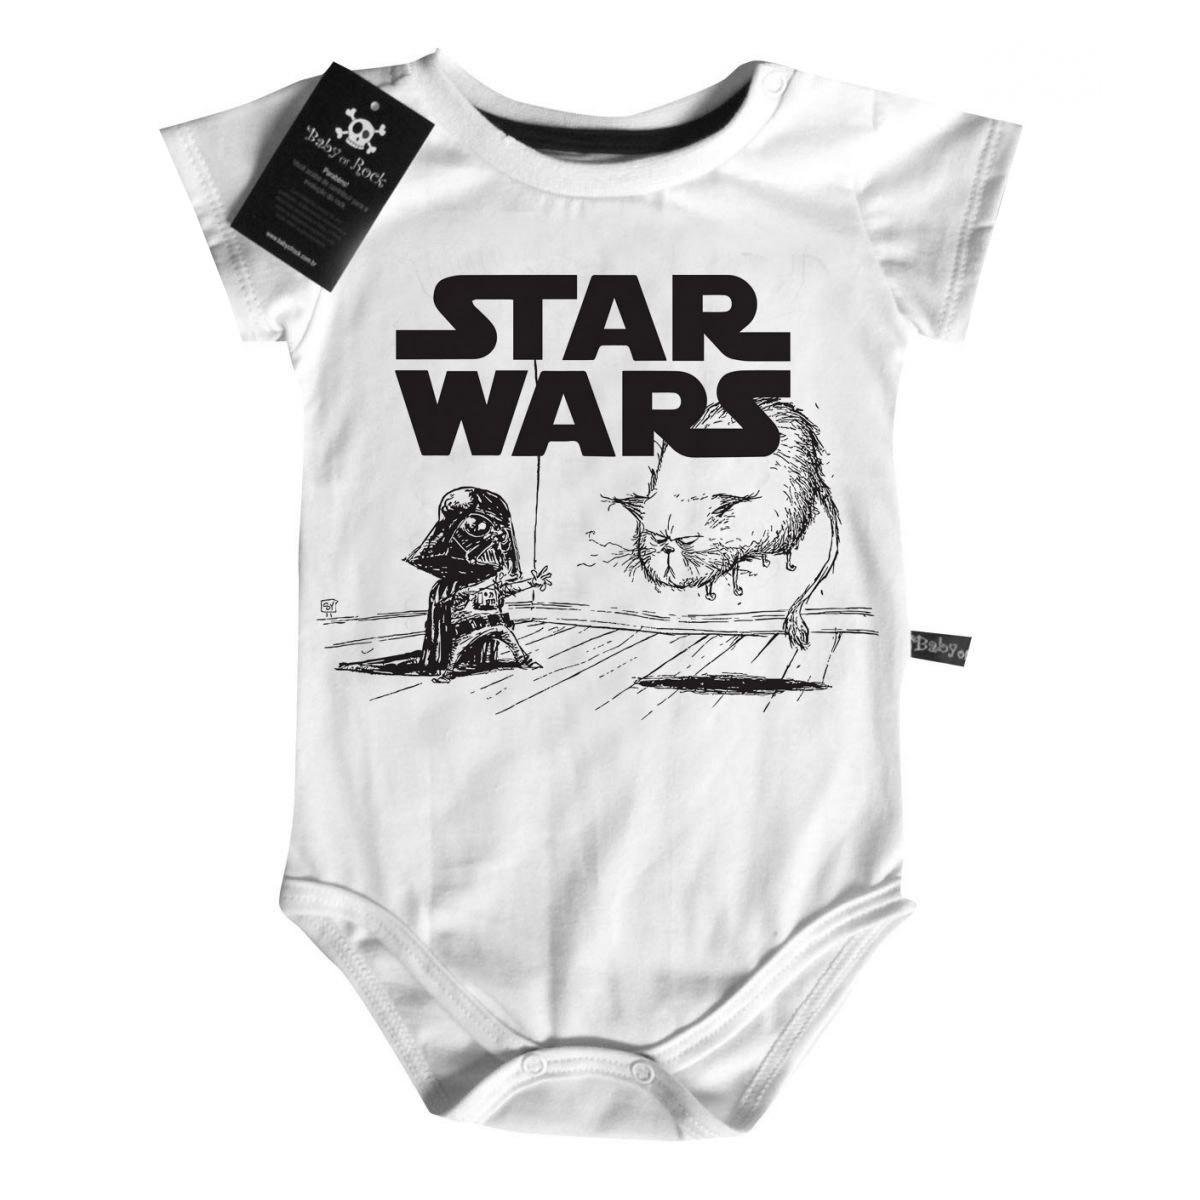 Body Baby Filmes - Star Wars- White  - Baby Monster - Body Bebe